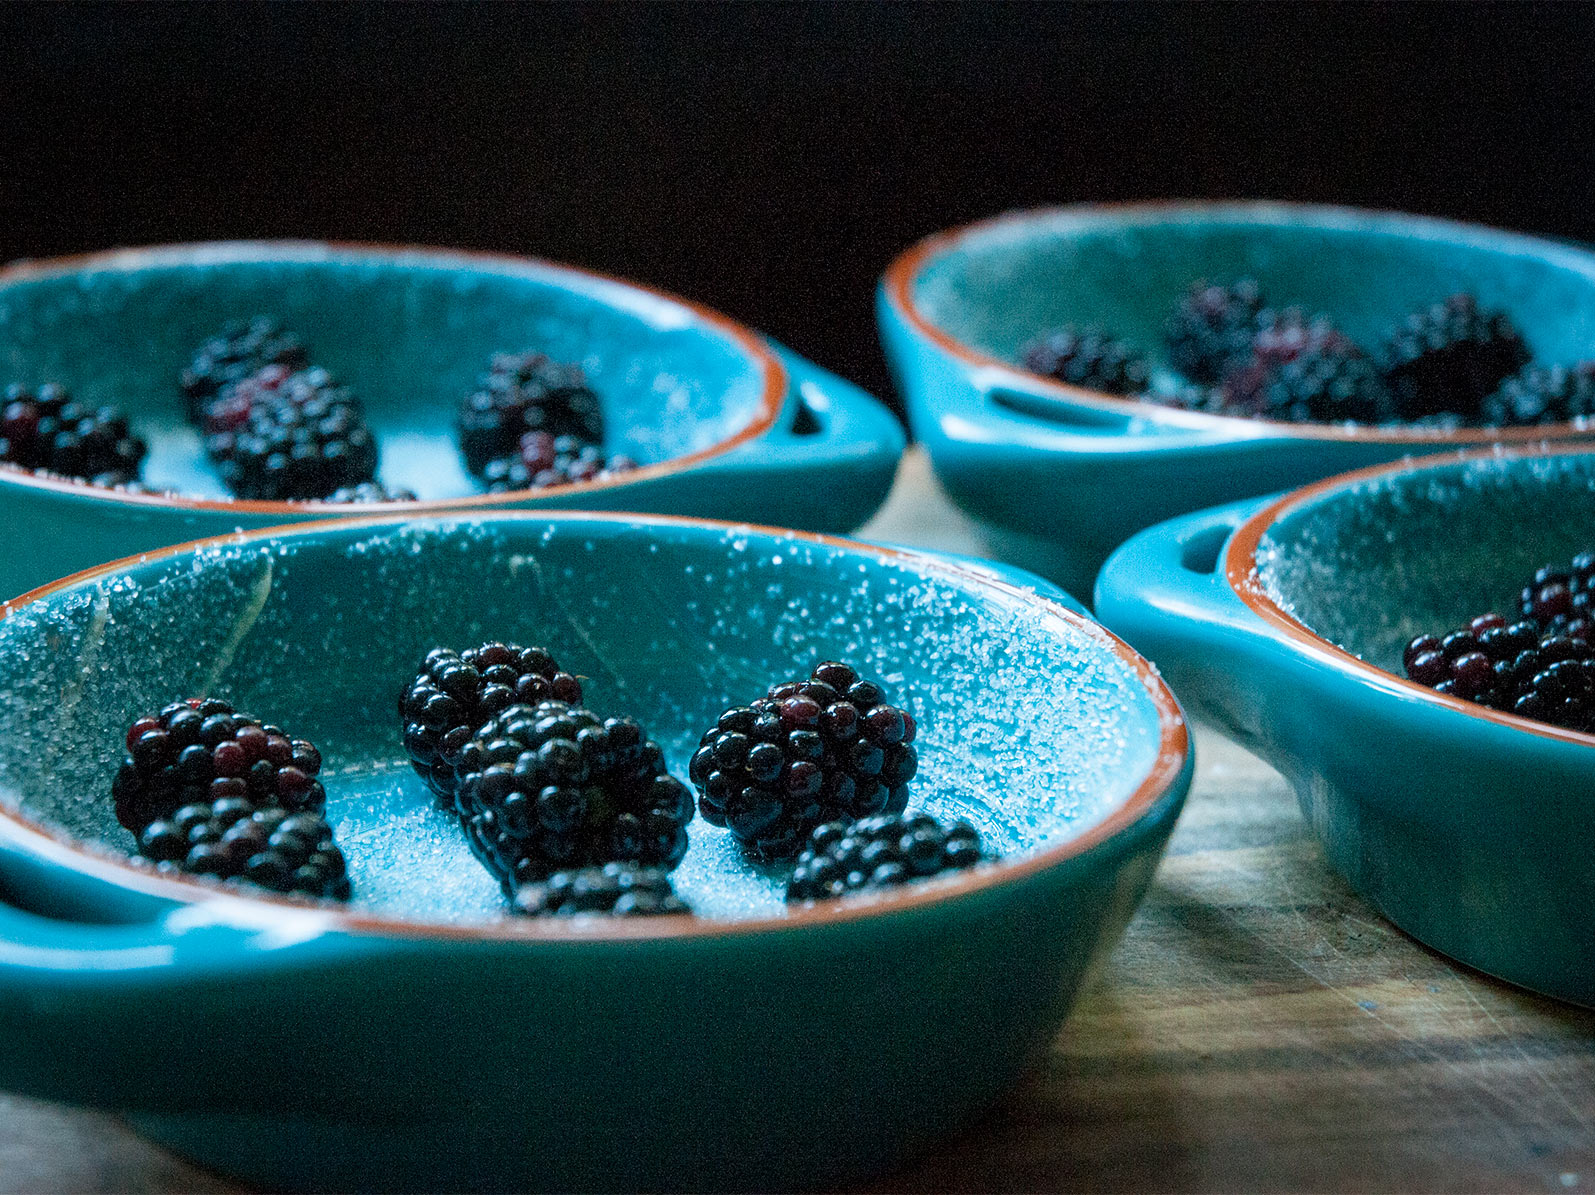 add the blackberries